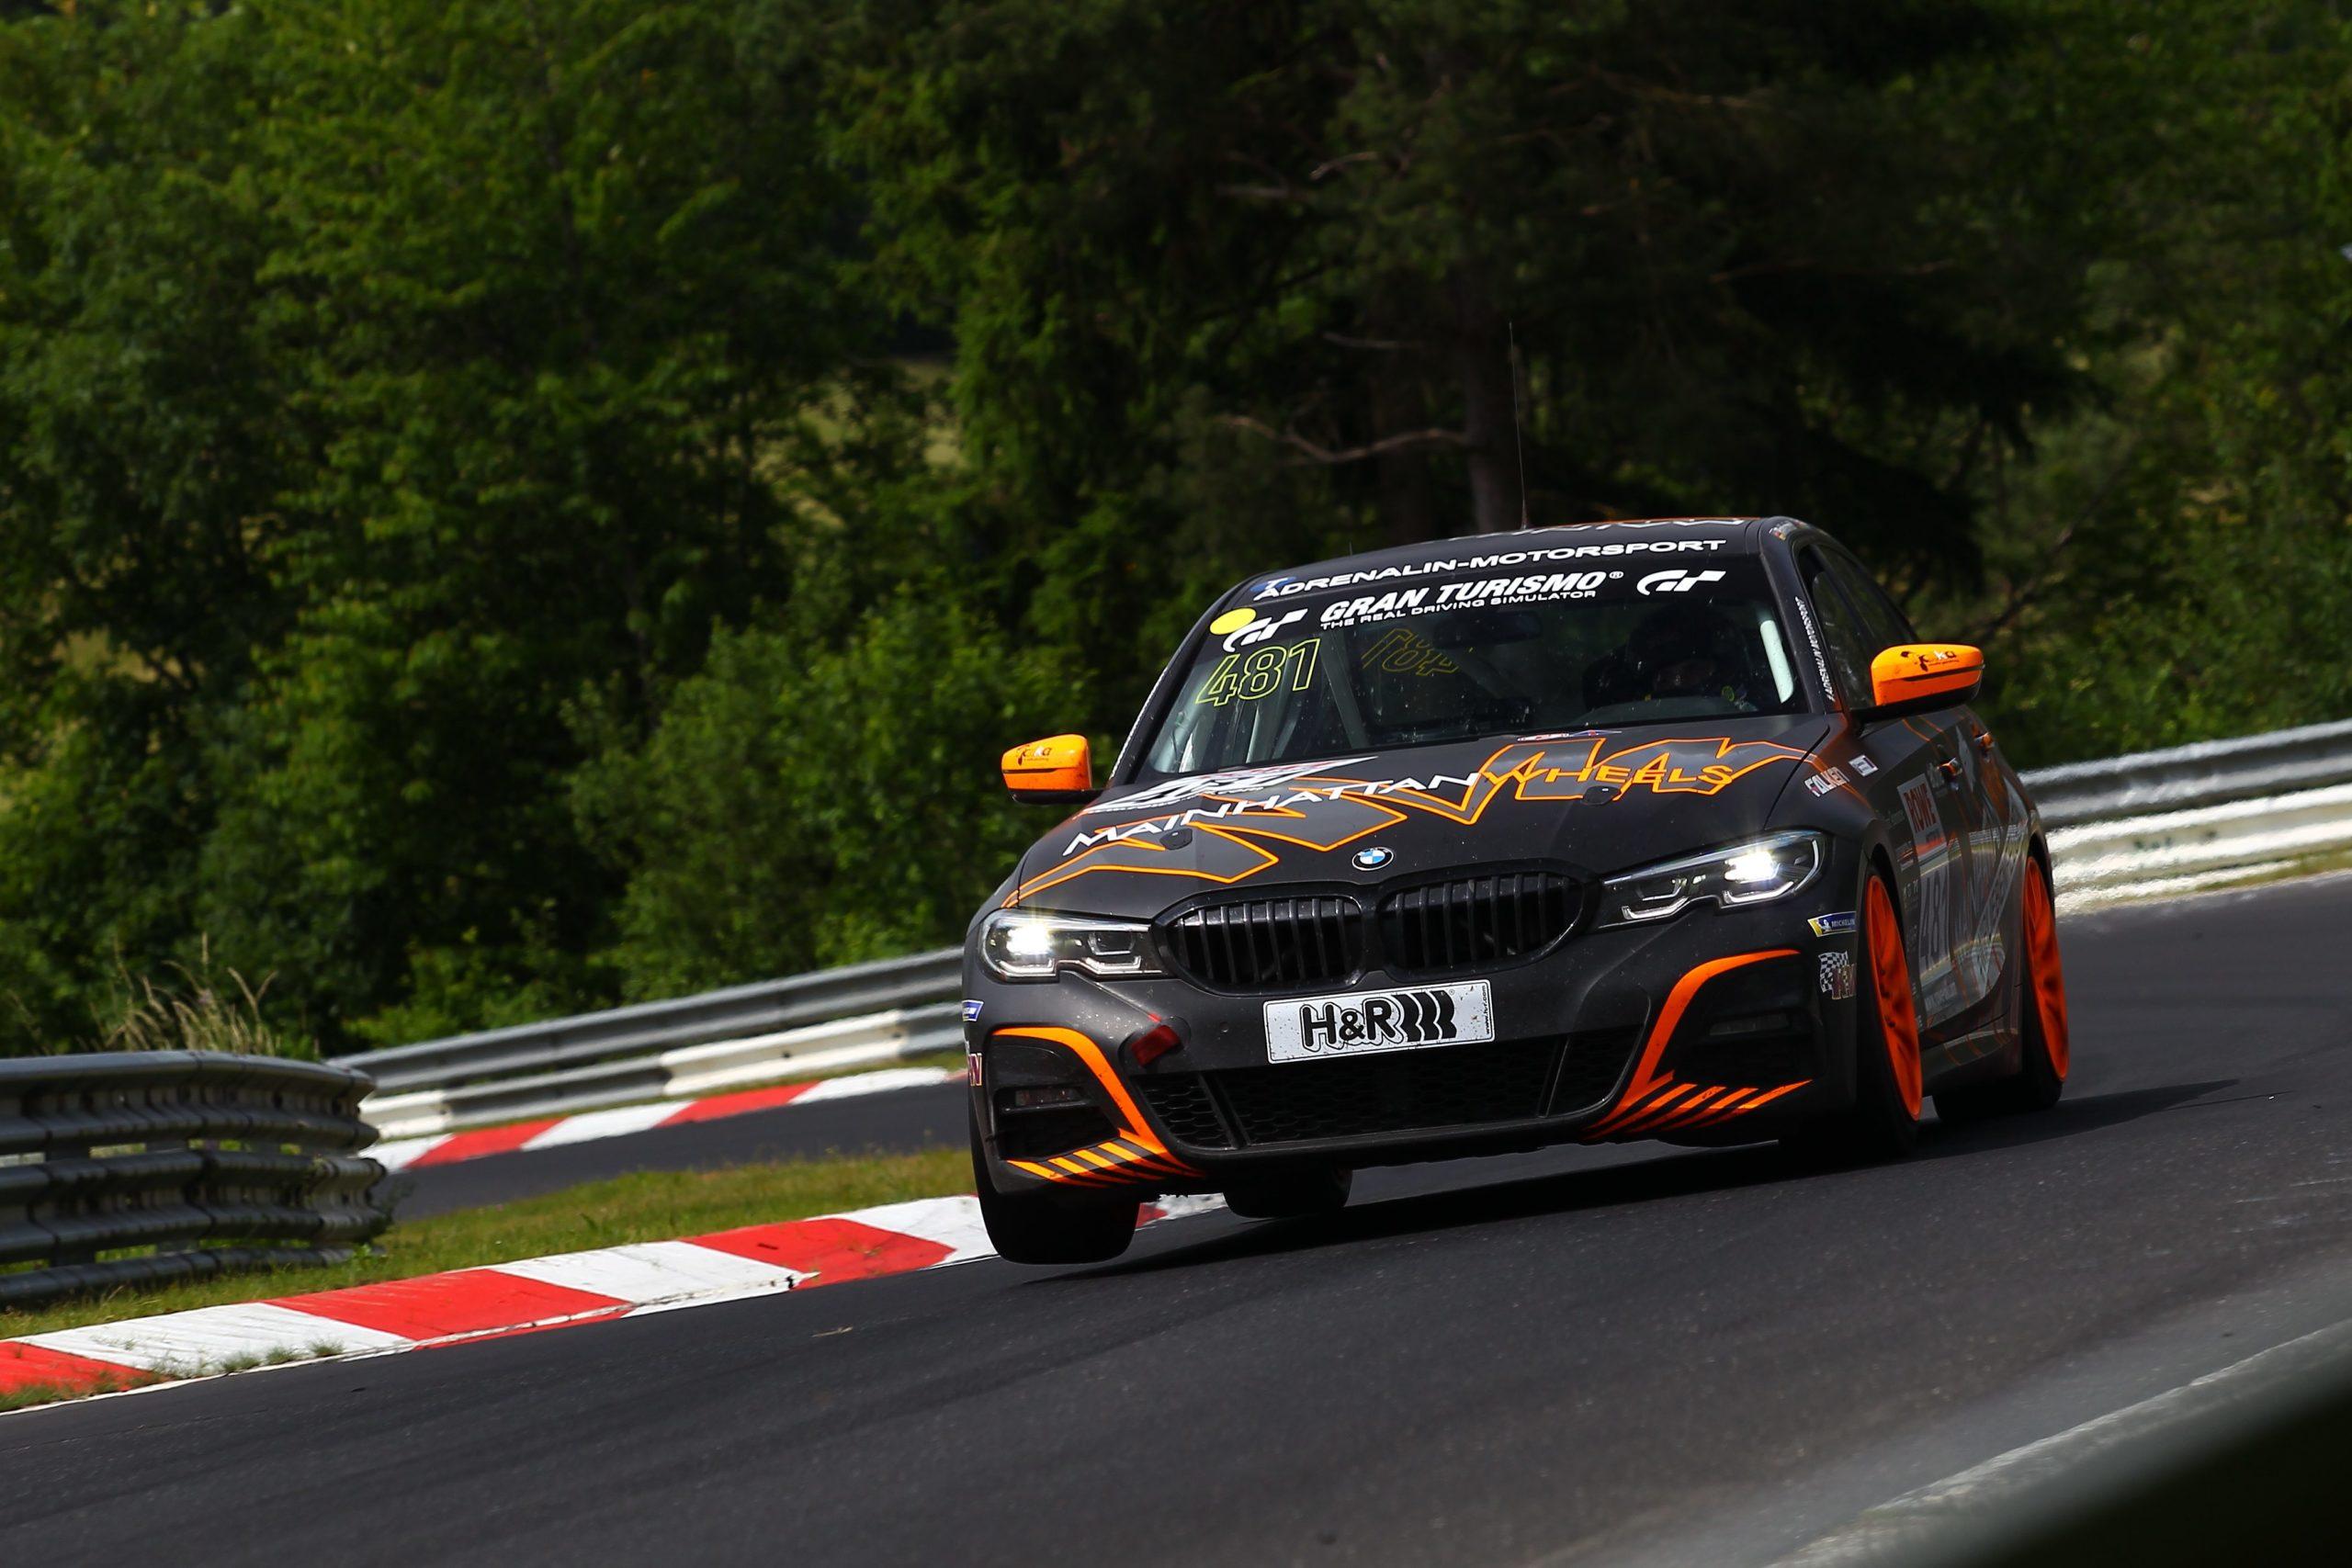 Adrenalin Motorsport: Tabellenführung verteidigt